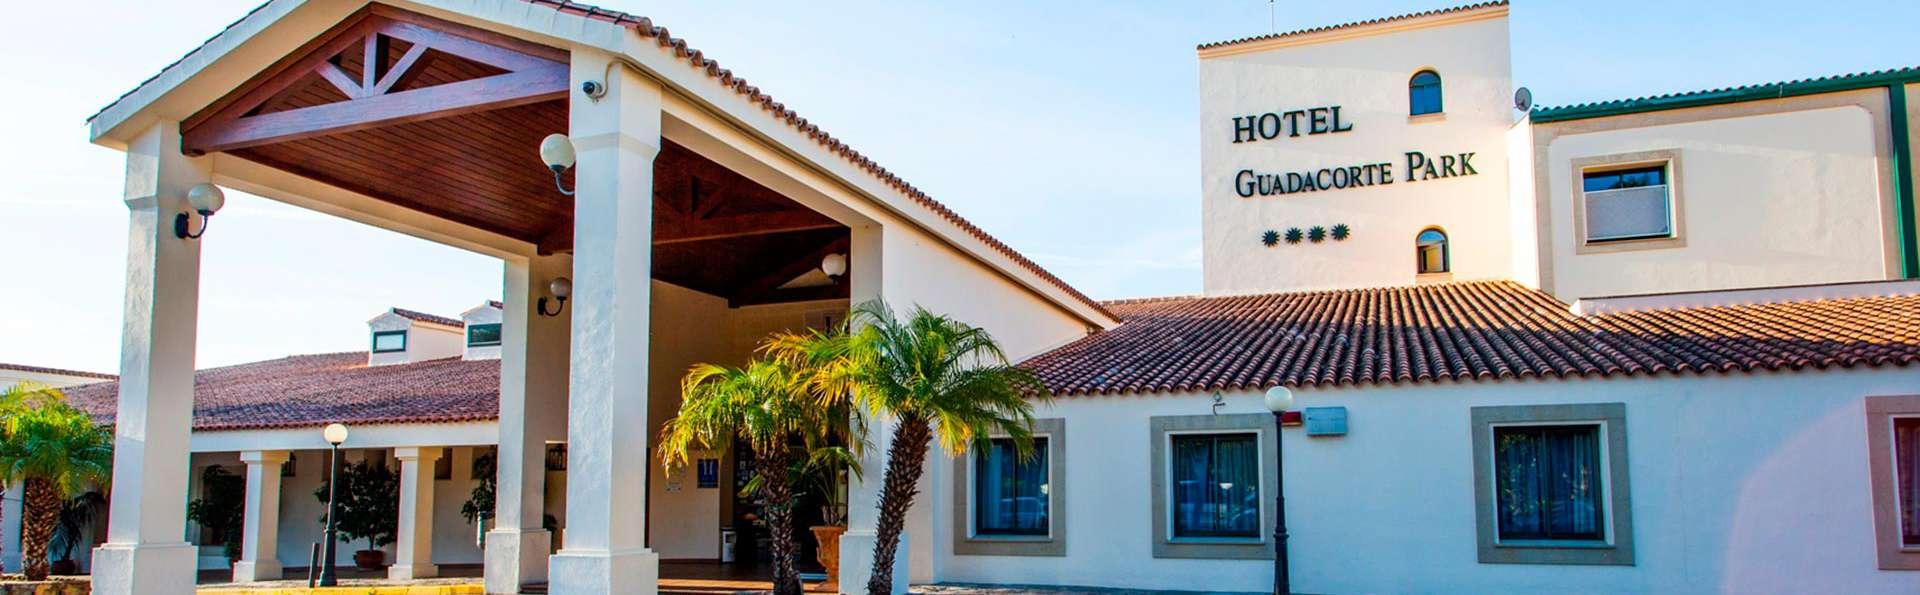 Hotel Guadacorte Park - edit_Entrada_Hotel.jpg